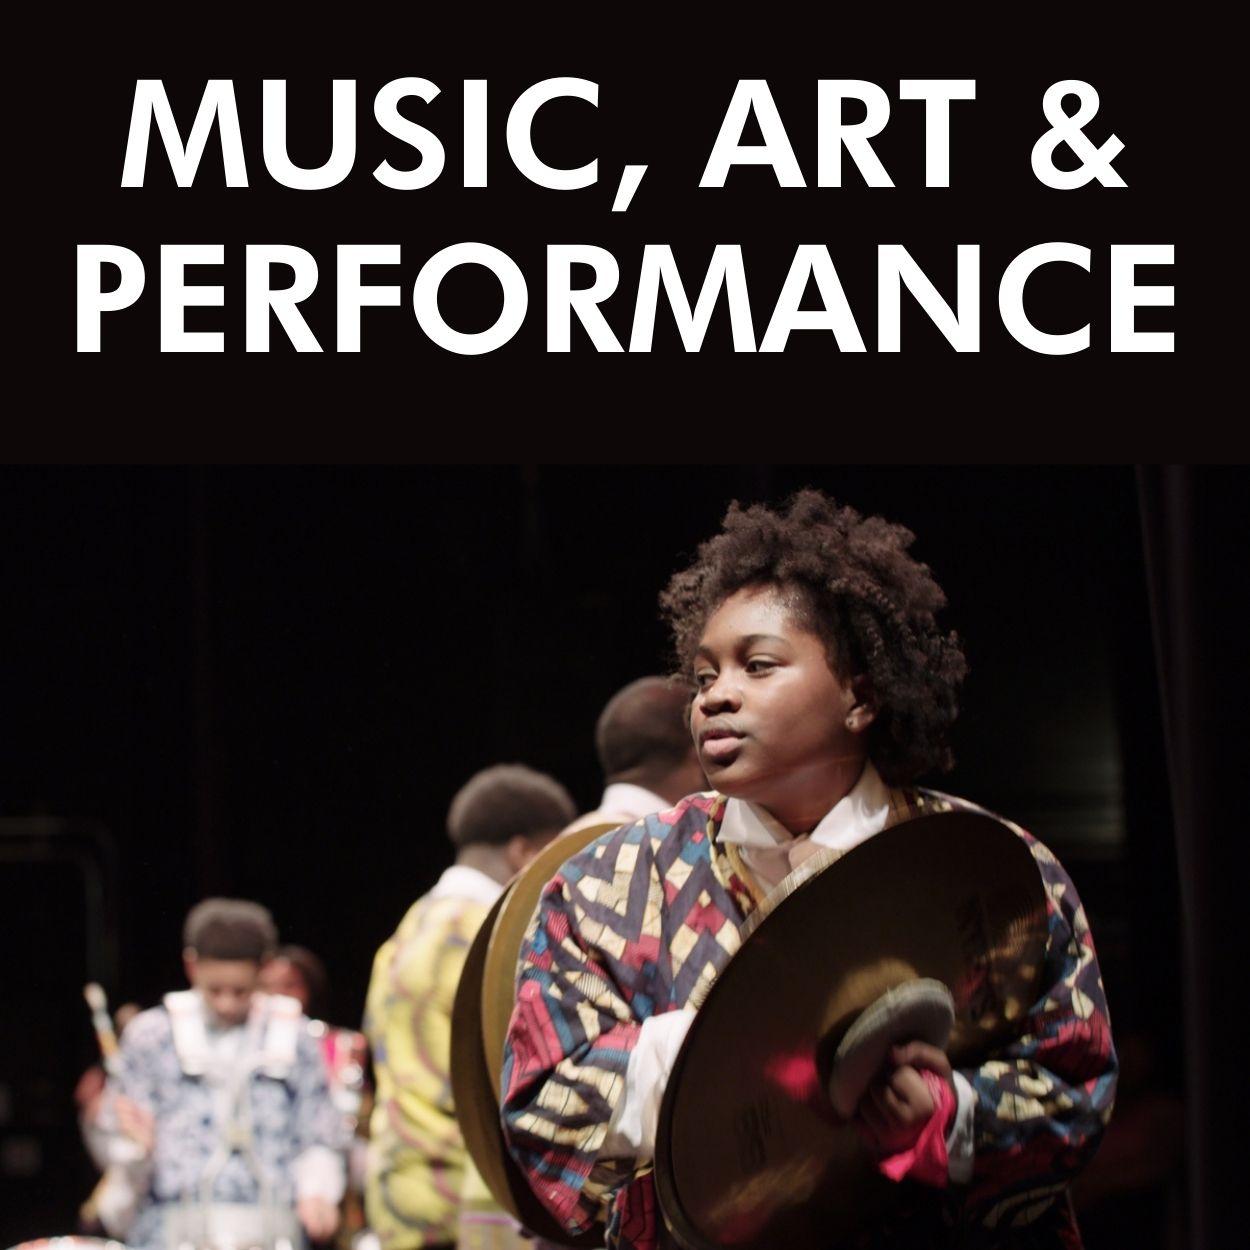 MUSIC, ART & PERFORMANCE (3)